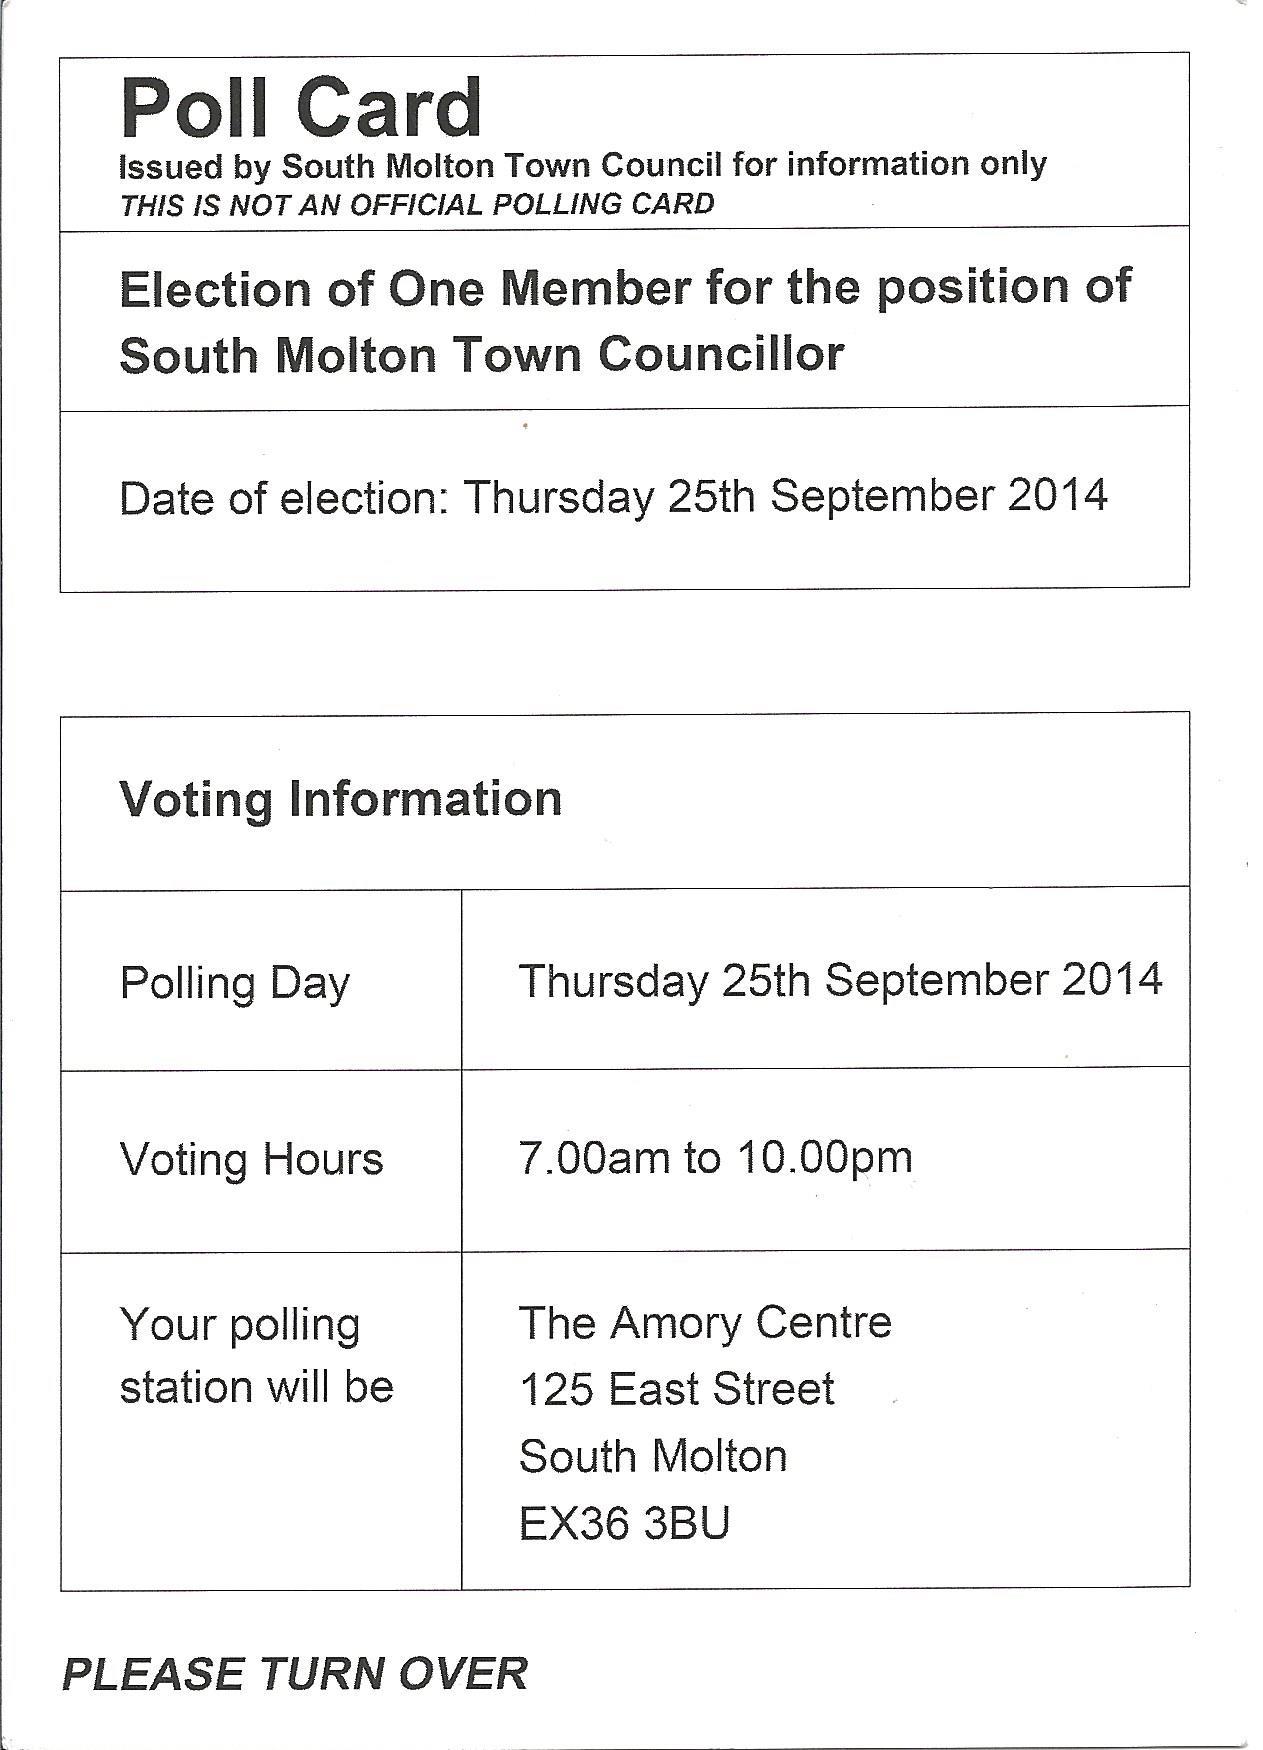 Poll Card Side 1